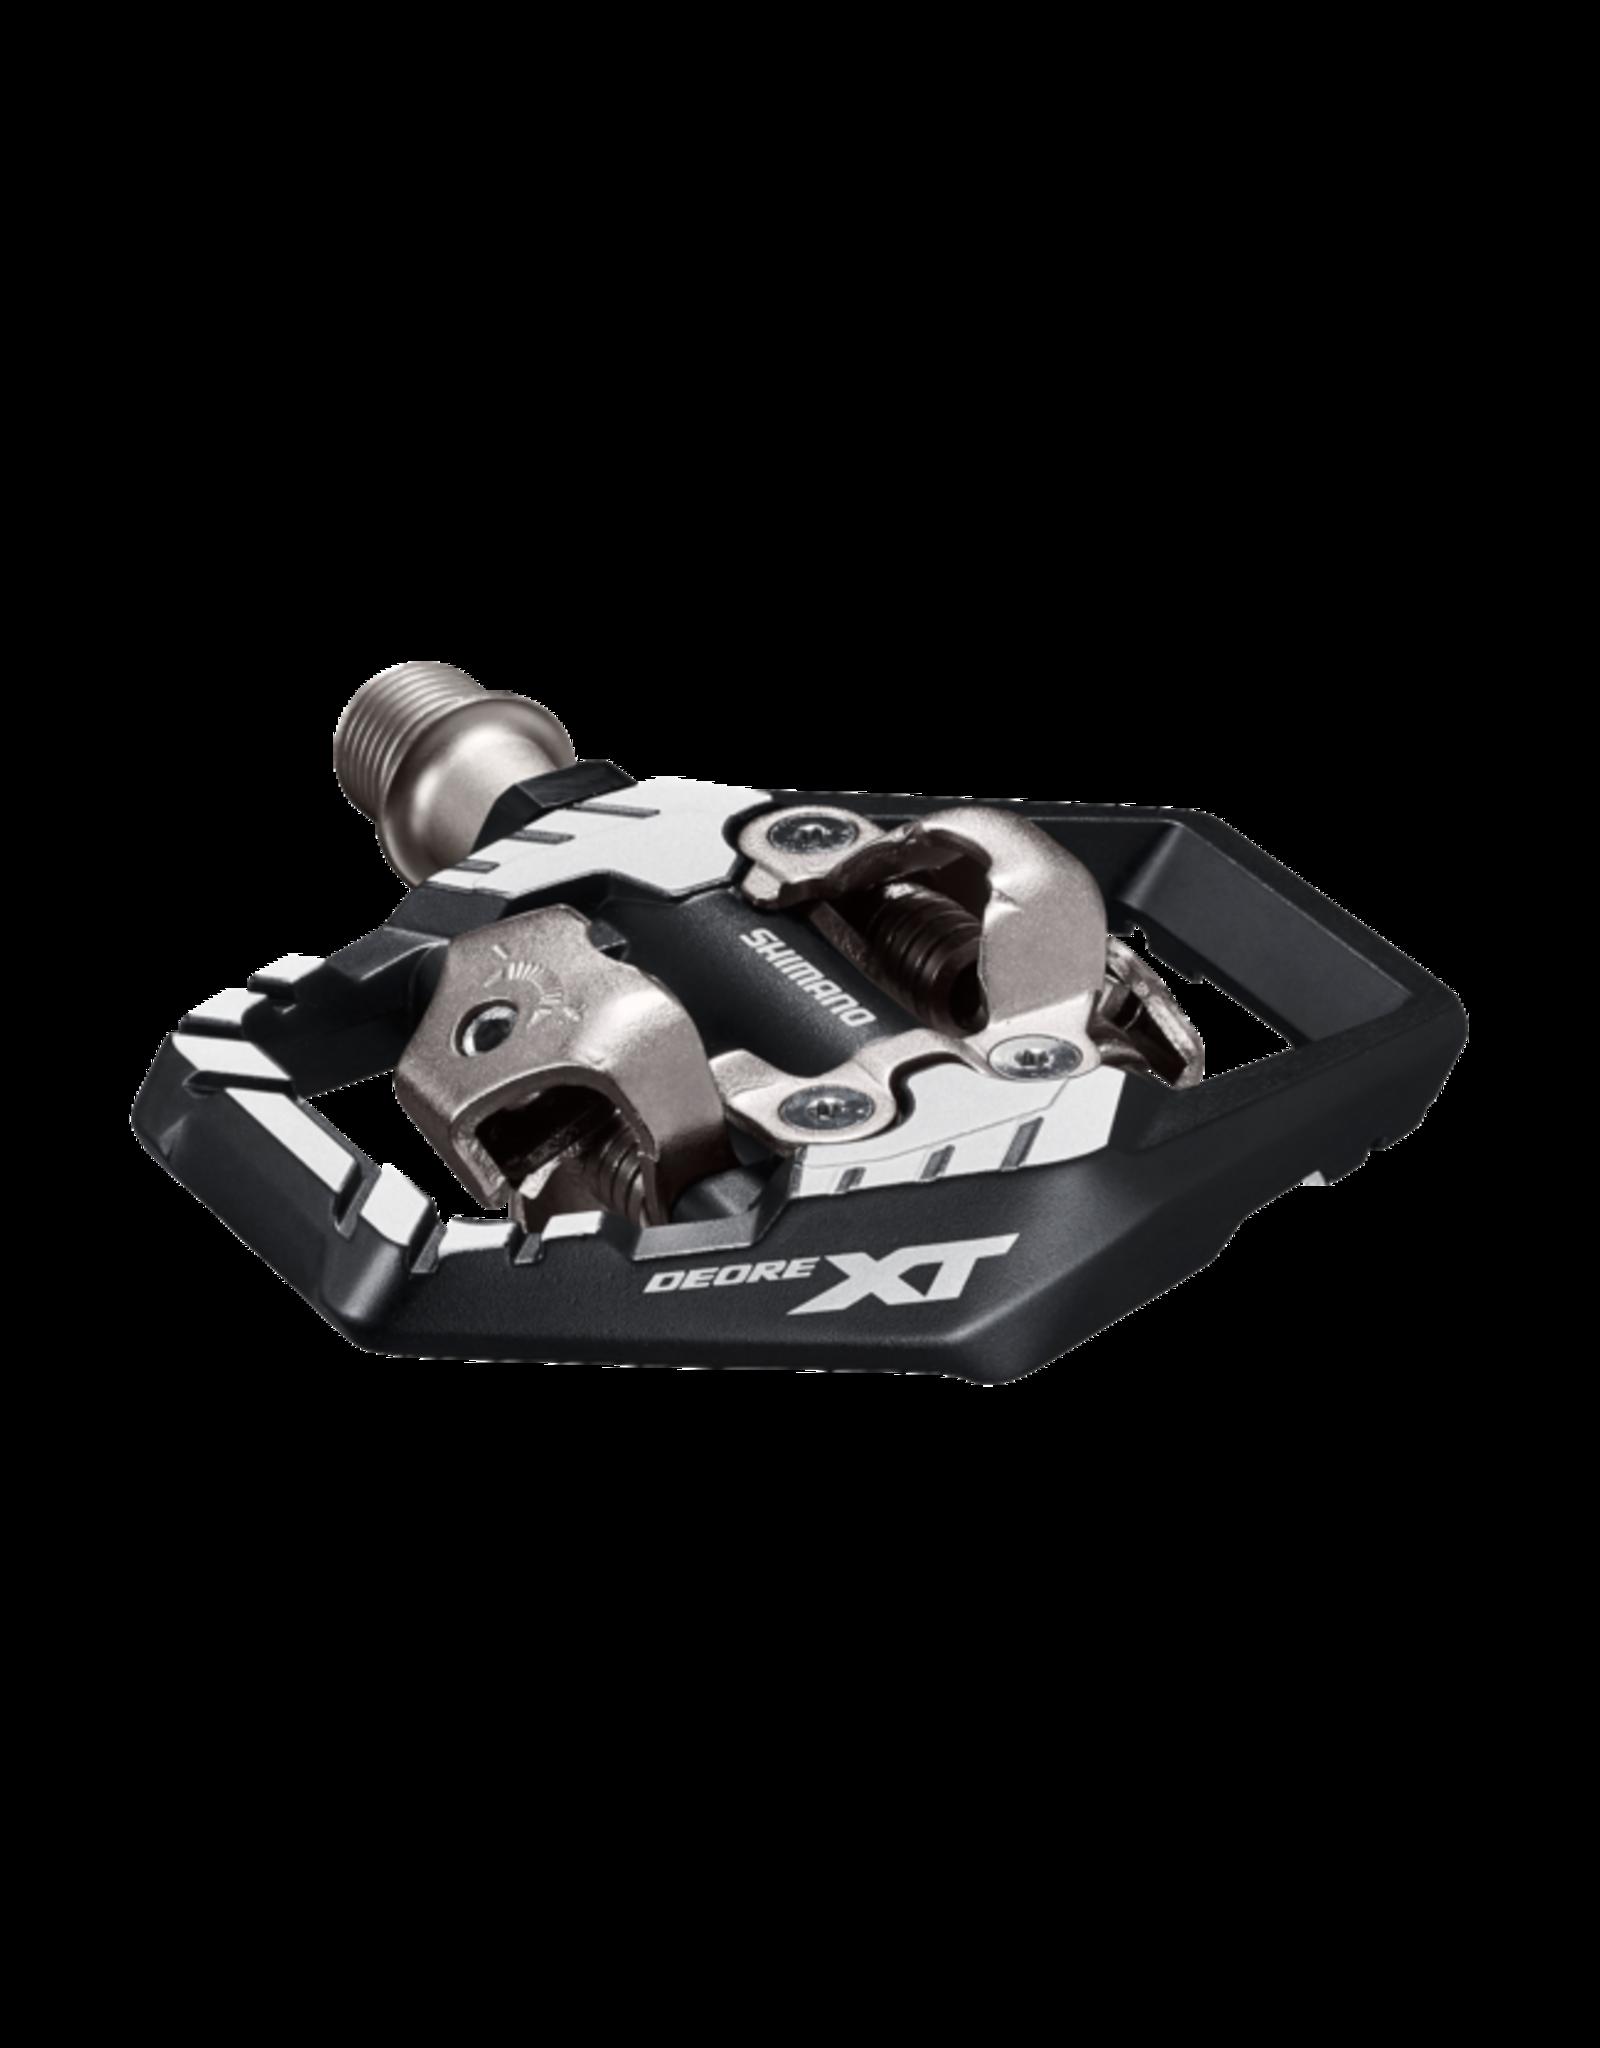 Shimano Shimano M8120 Deore XT Pedals